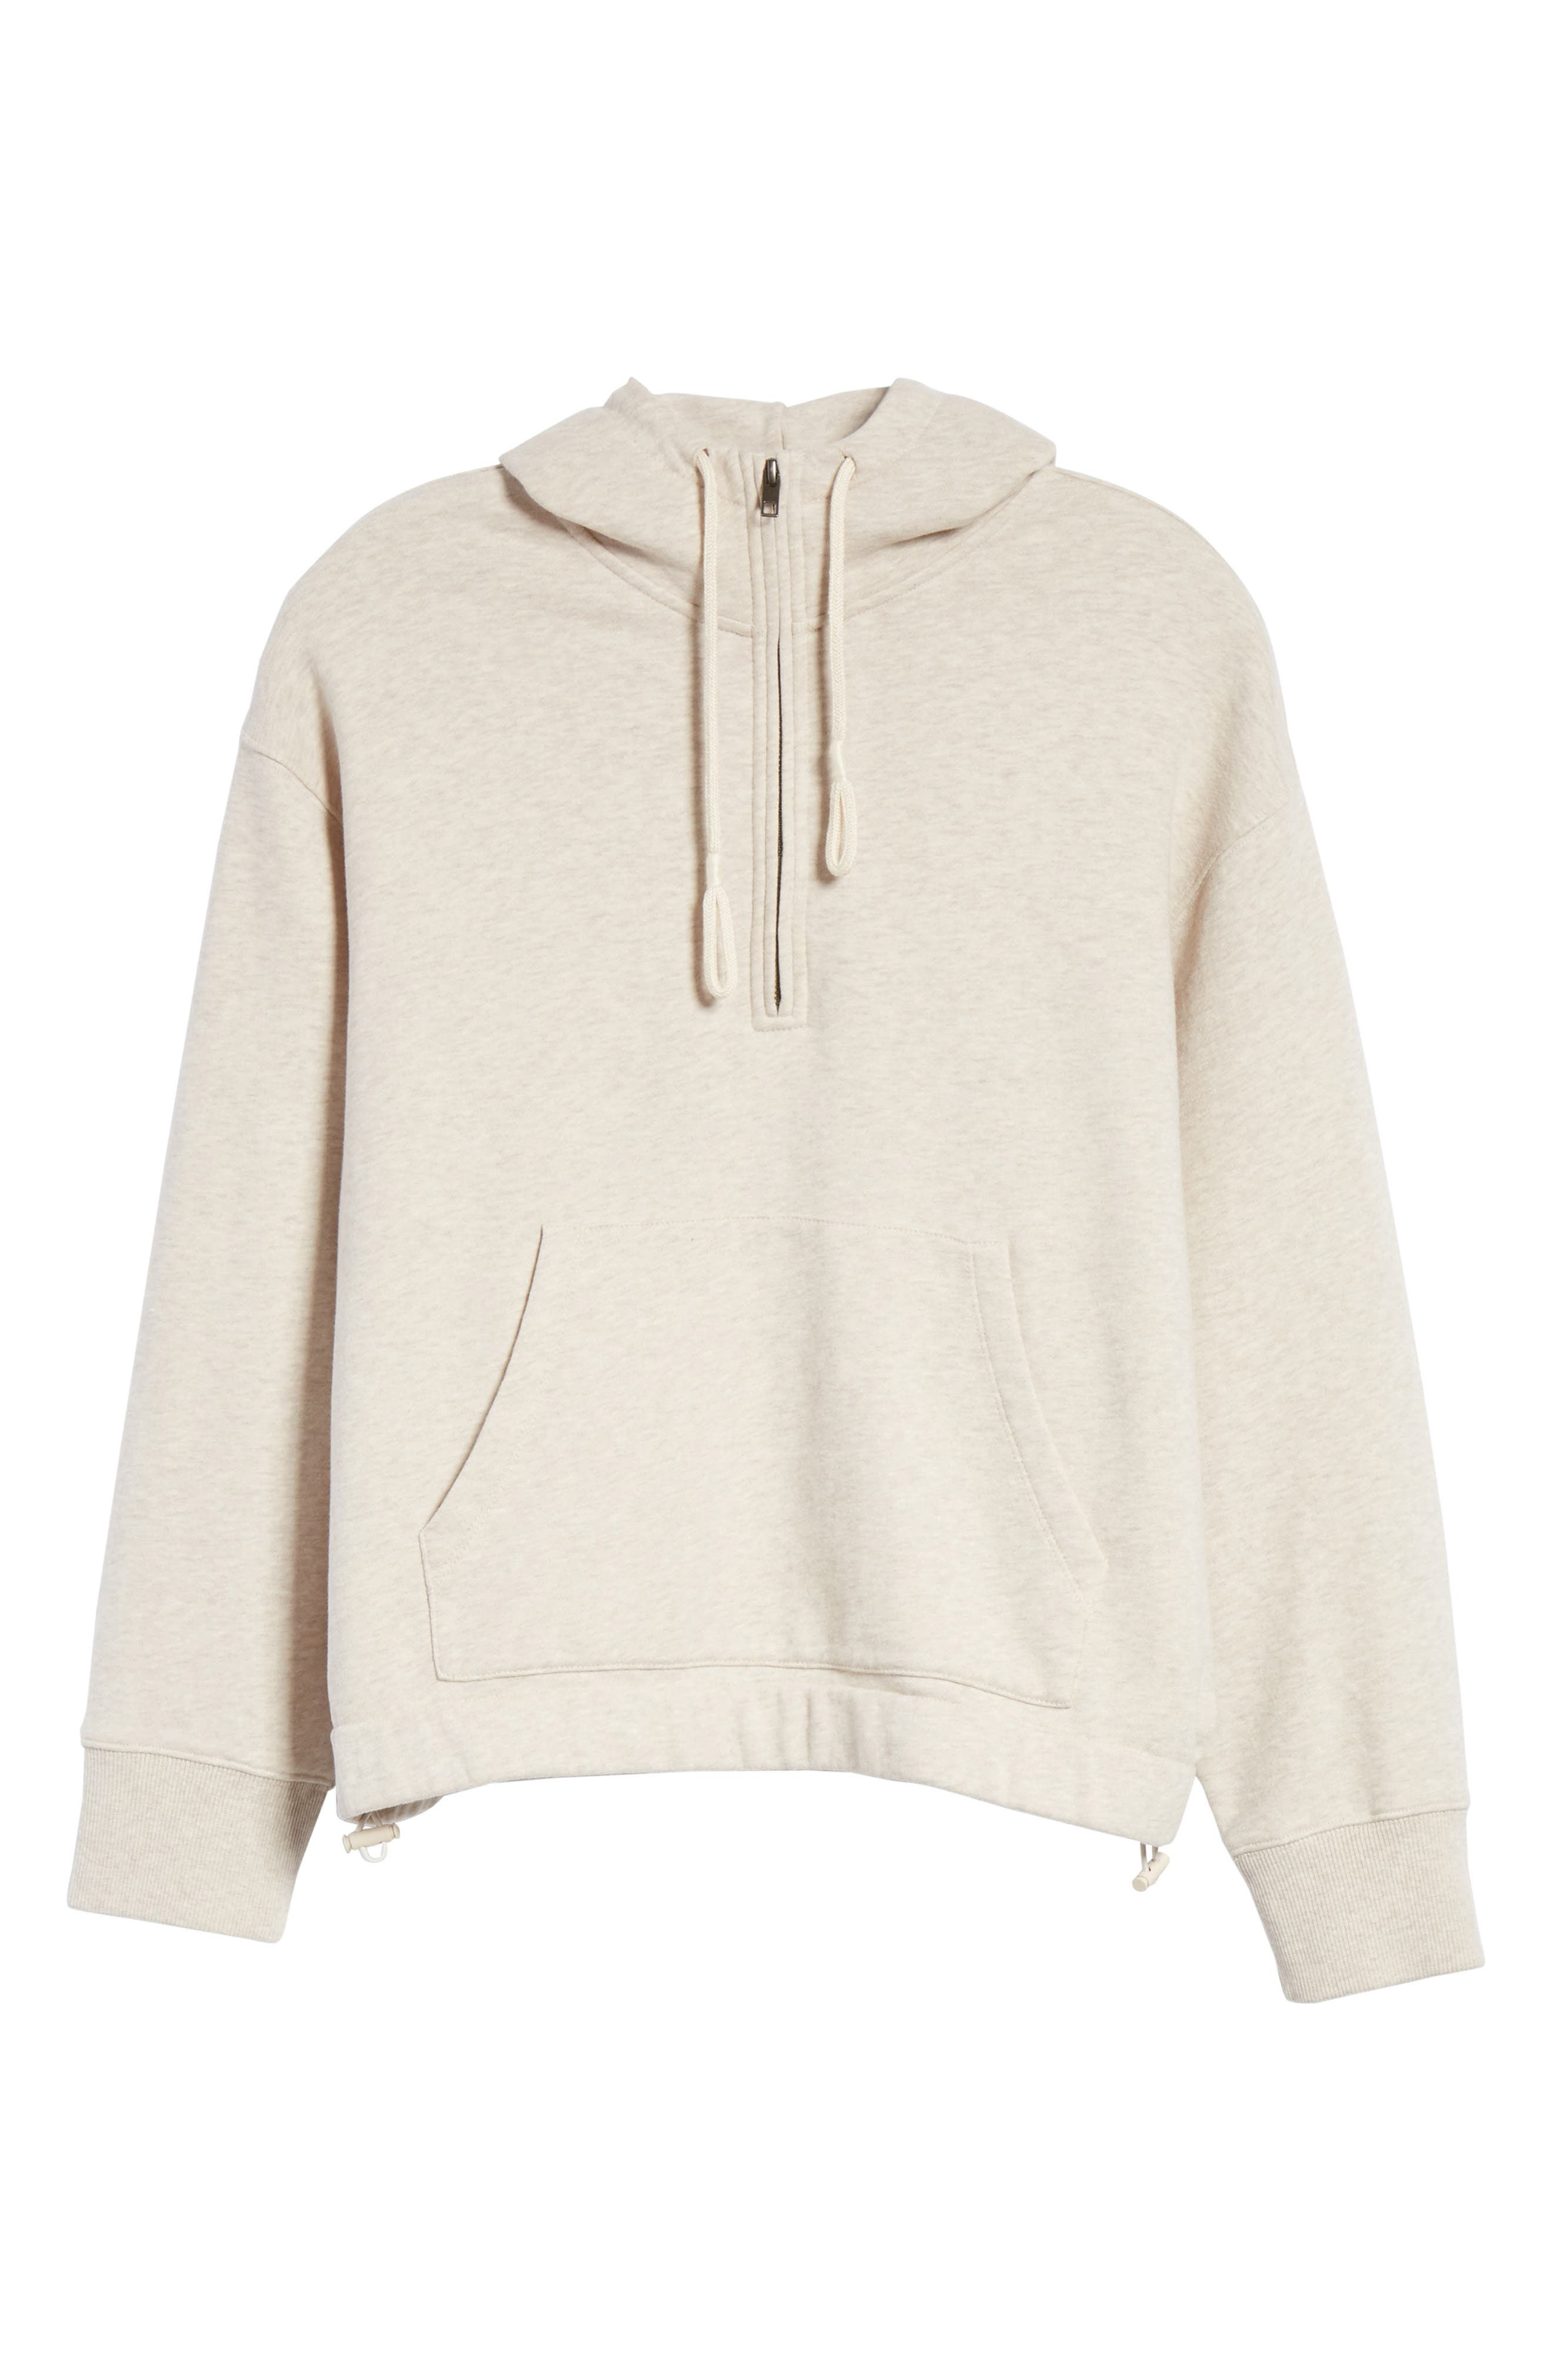 Half Zip Cotton Hoodie Sweatshirt,                             Alternate thumbnail 6, color,                             255